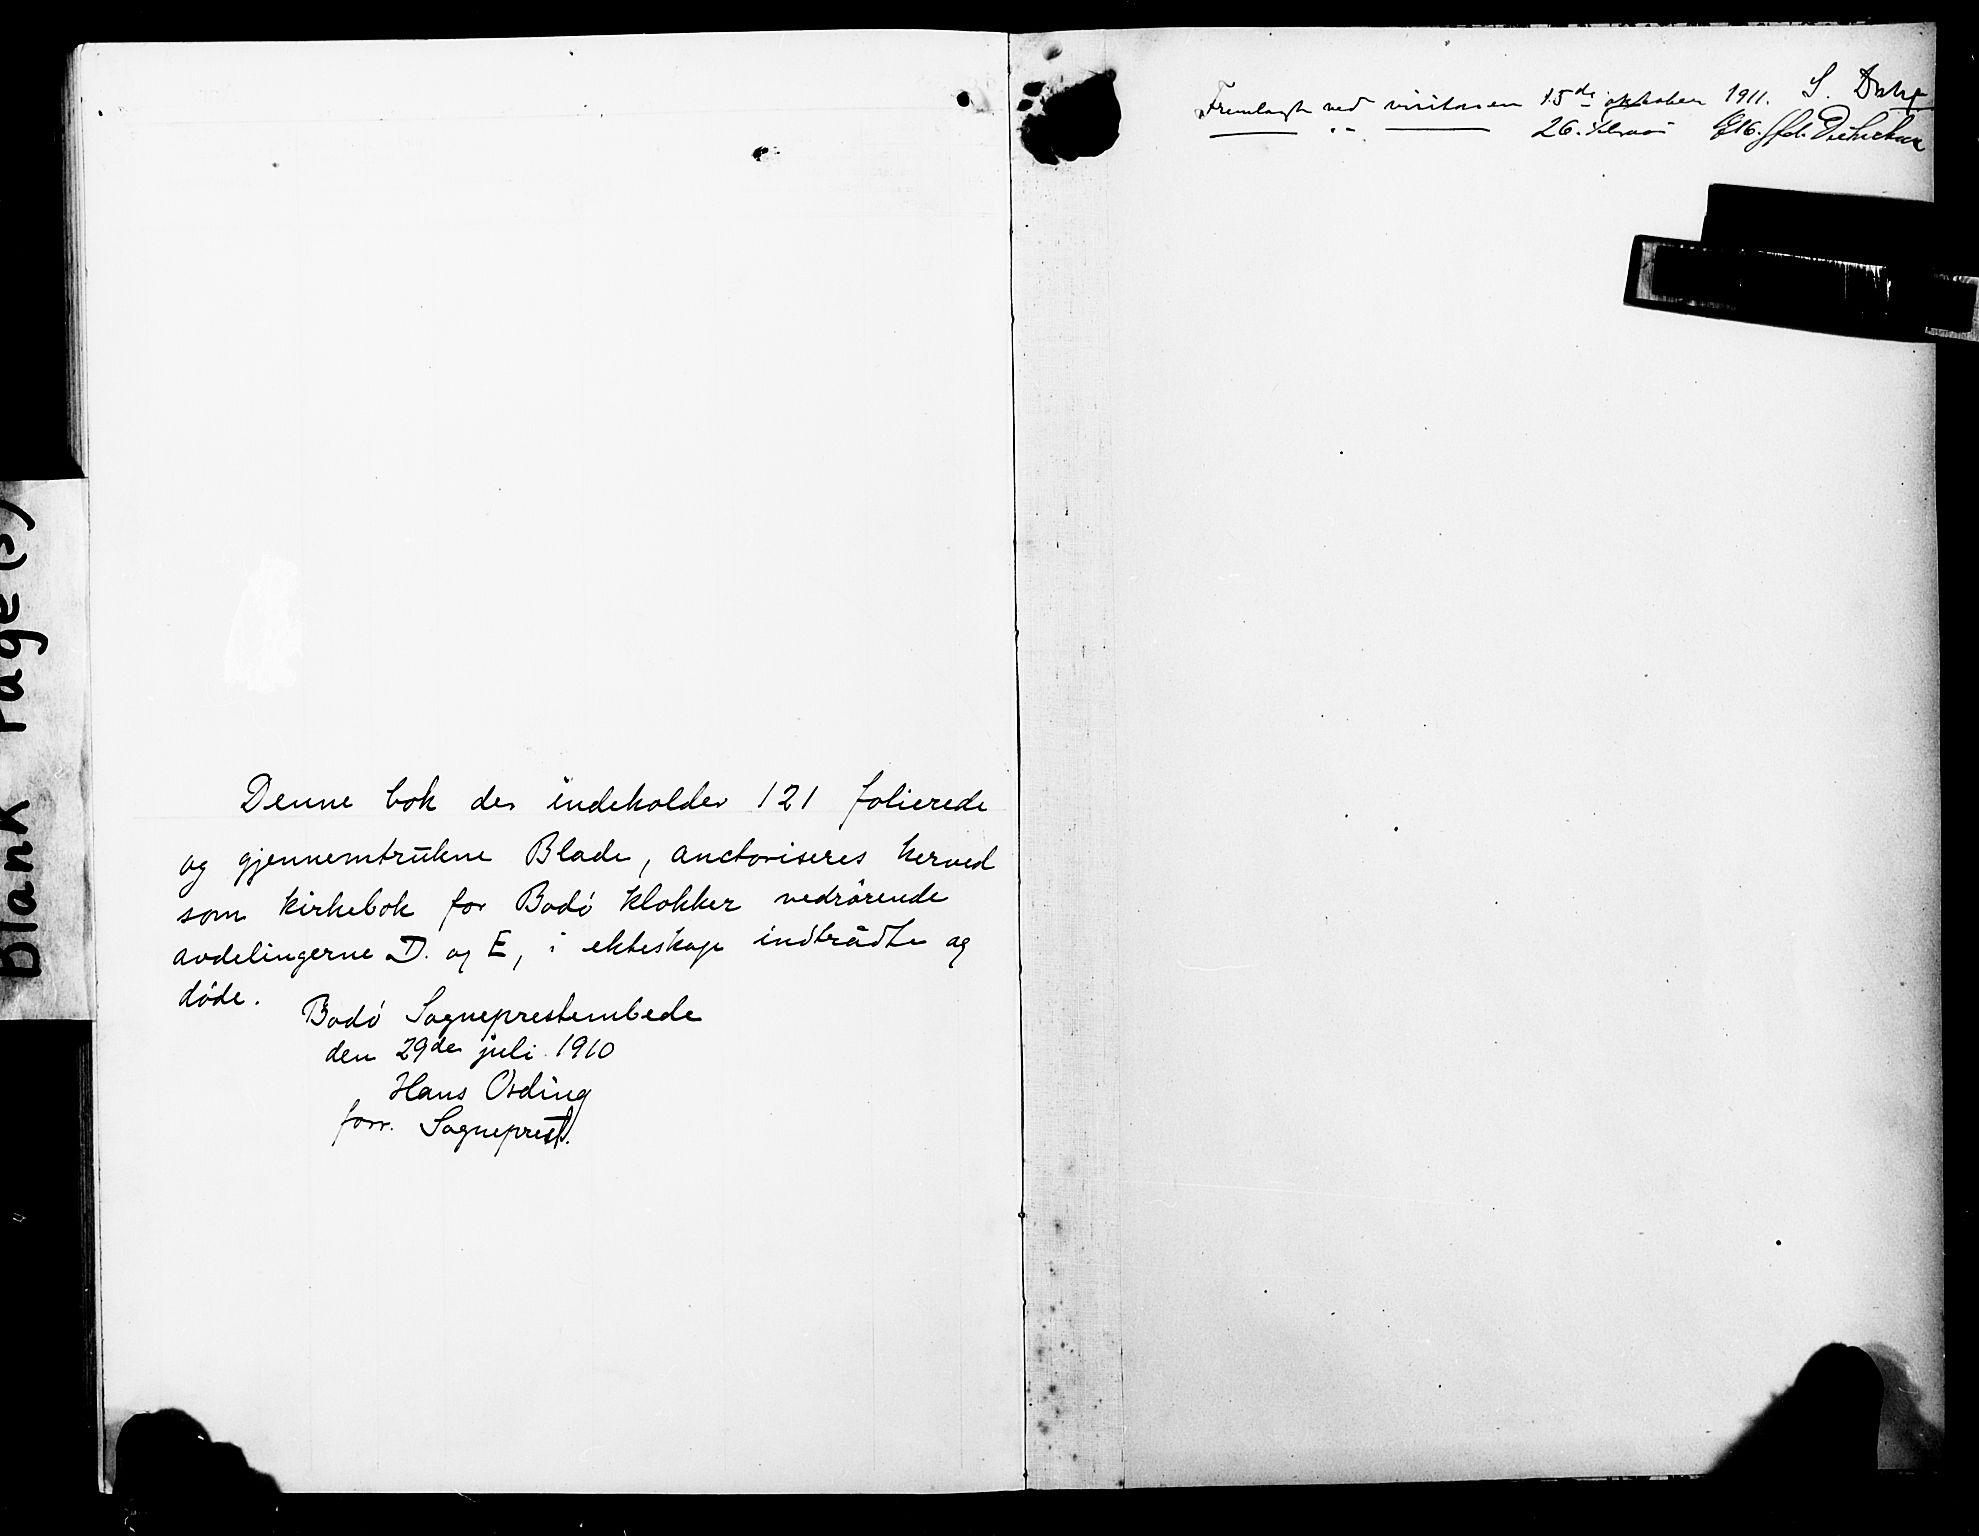 SAT, Ministerialprotokoller, klokkerbøker og fødselsregistre - Nordland, 801/L0035: Klokkerbok nr. 801C10, 1910-1923